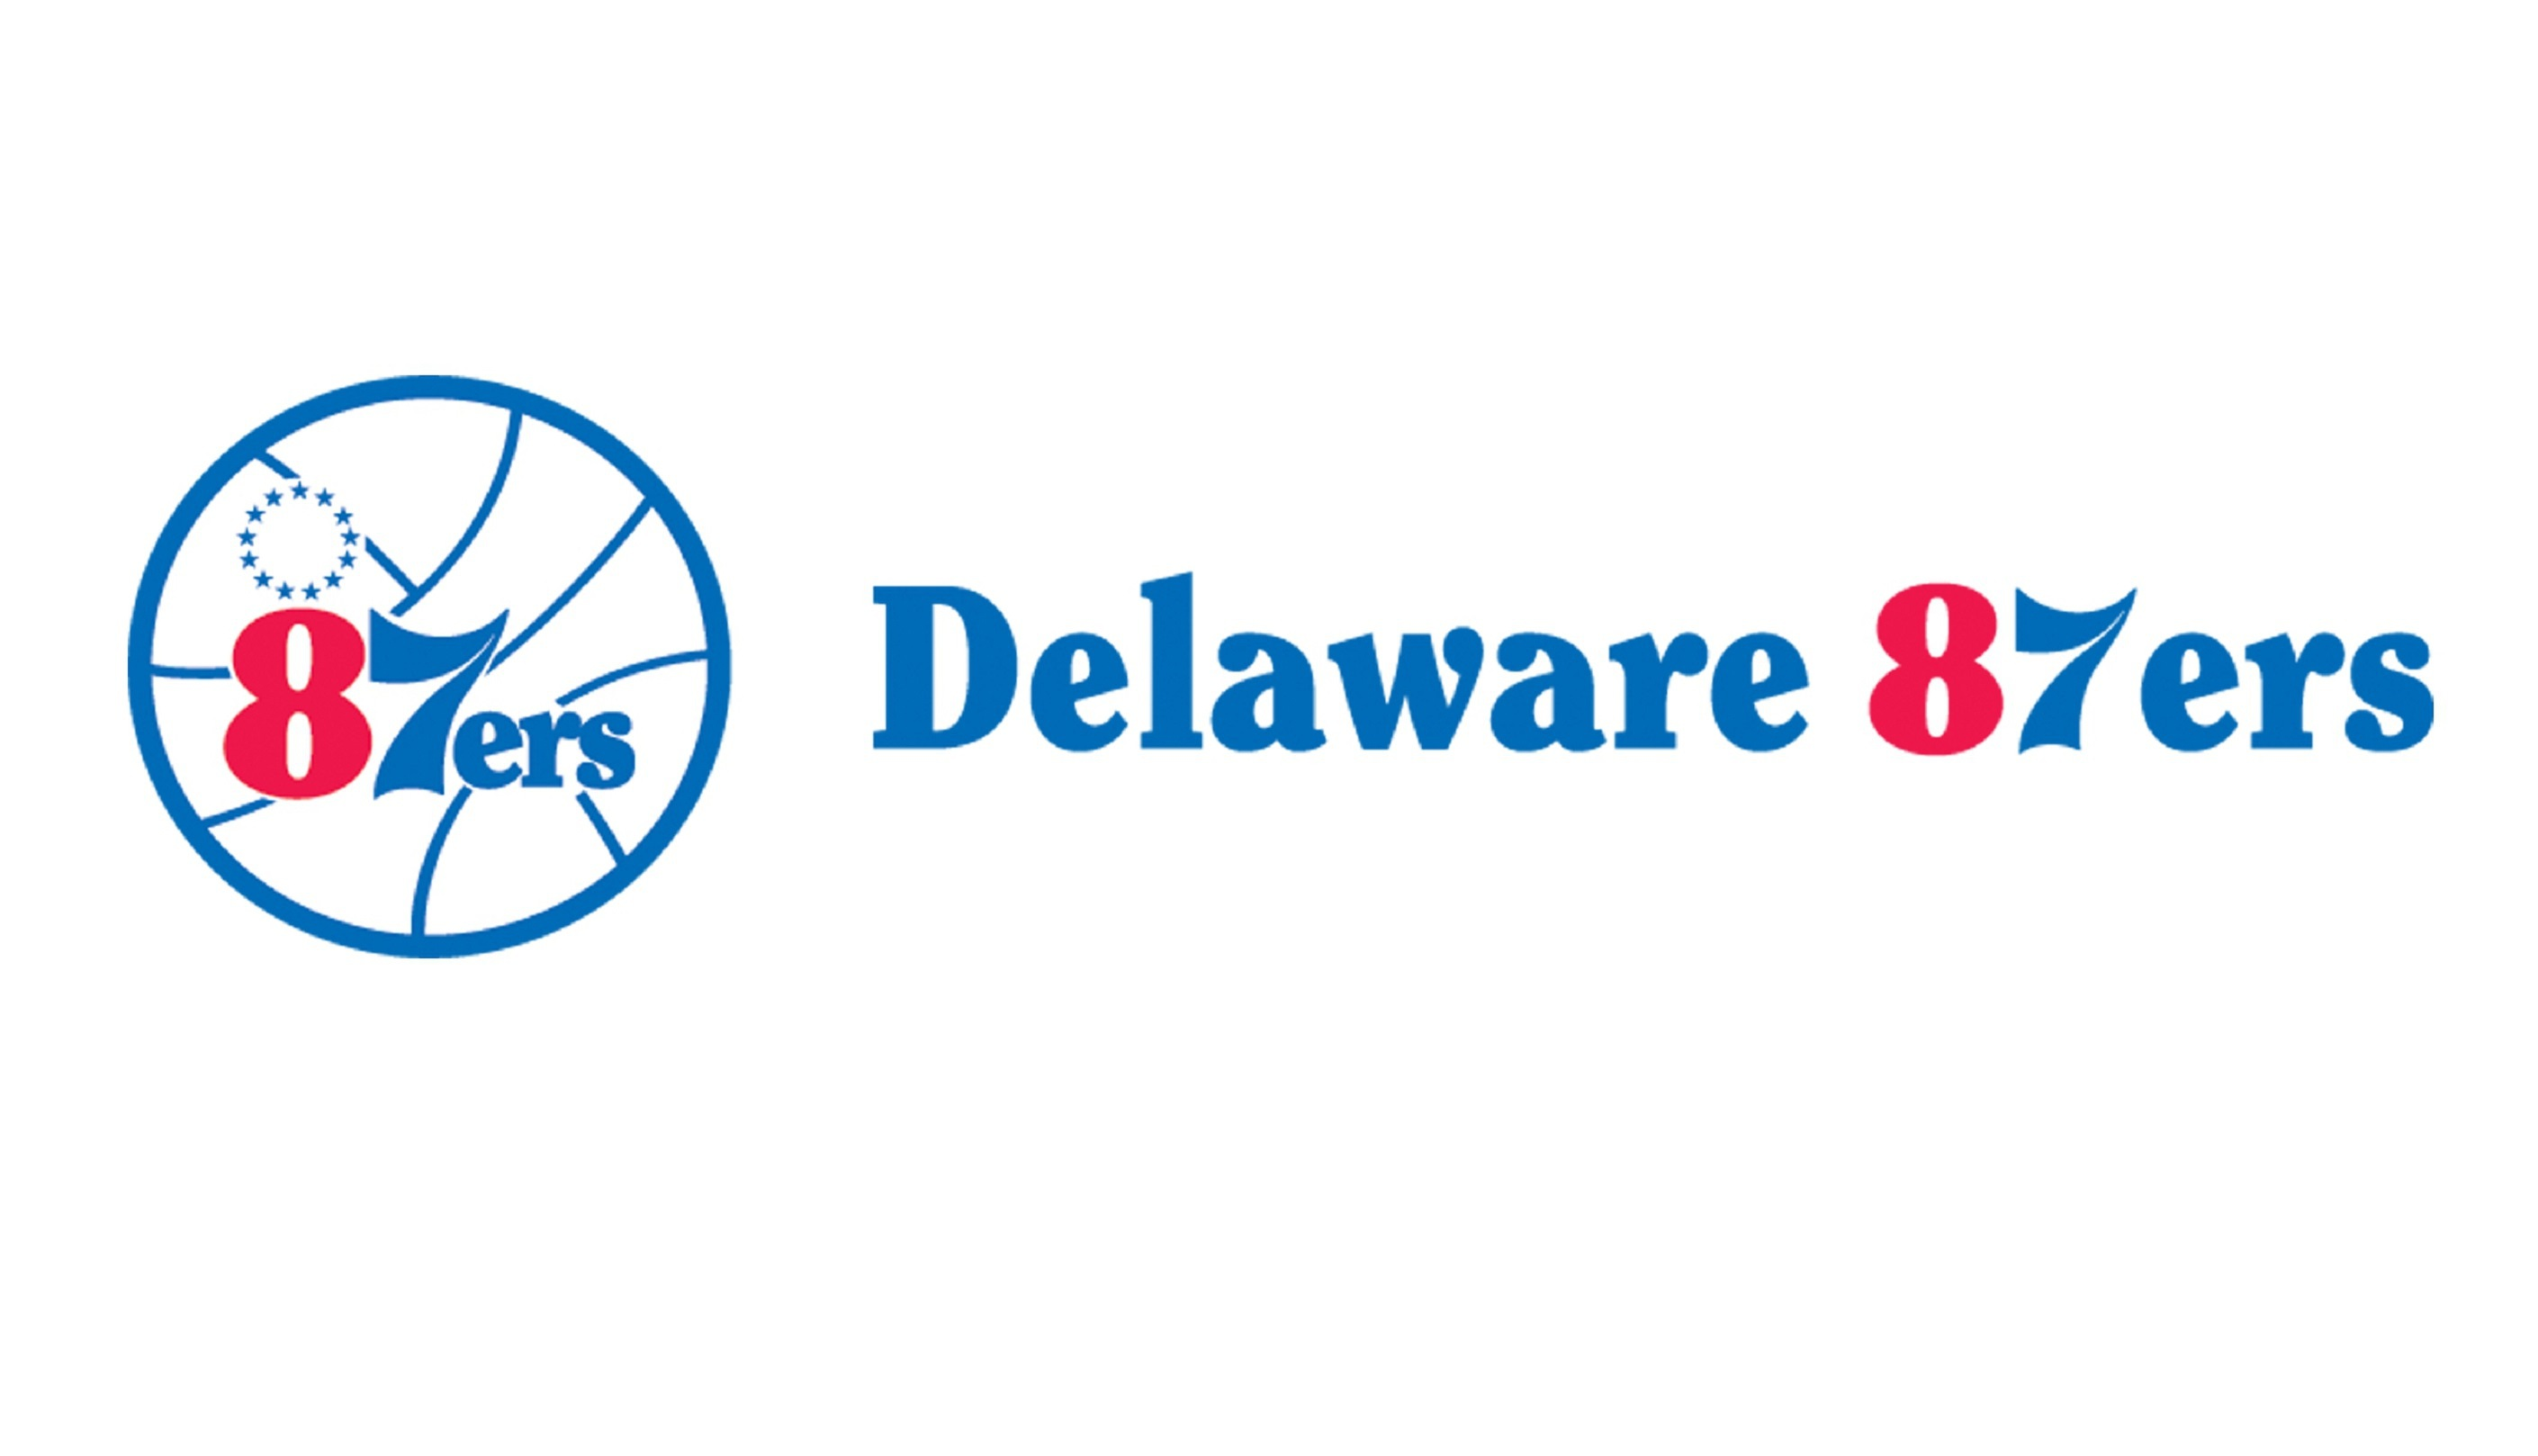 Delaware 87ers